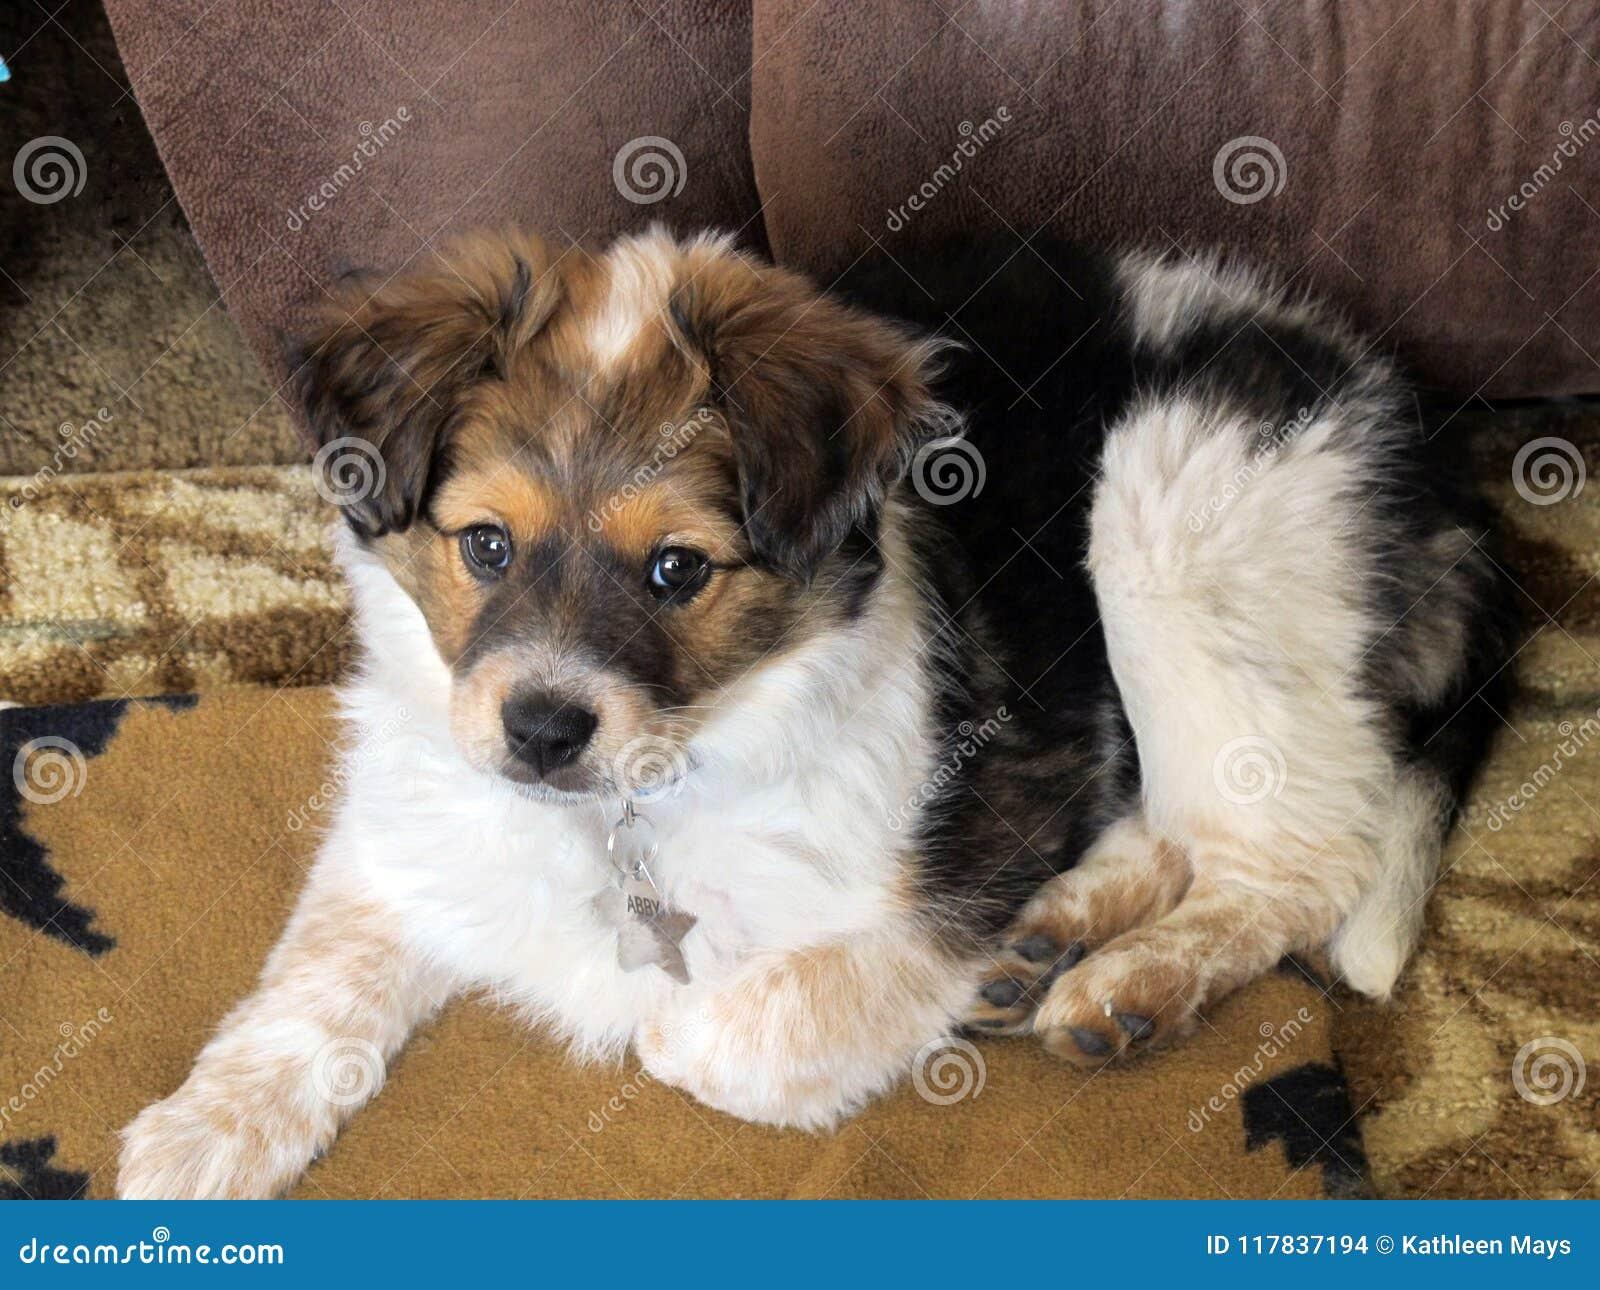 Tri Color Mini Aussie Puppy Portrait Stock Photo Image Of Animals Mammal 117837194